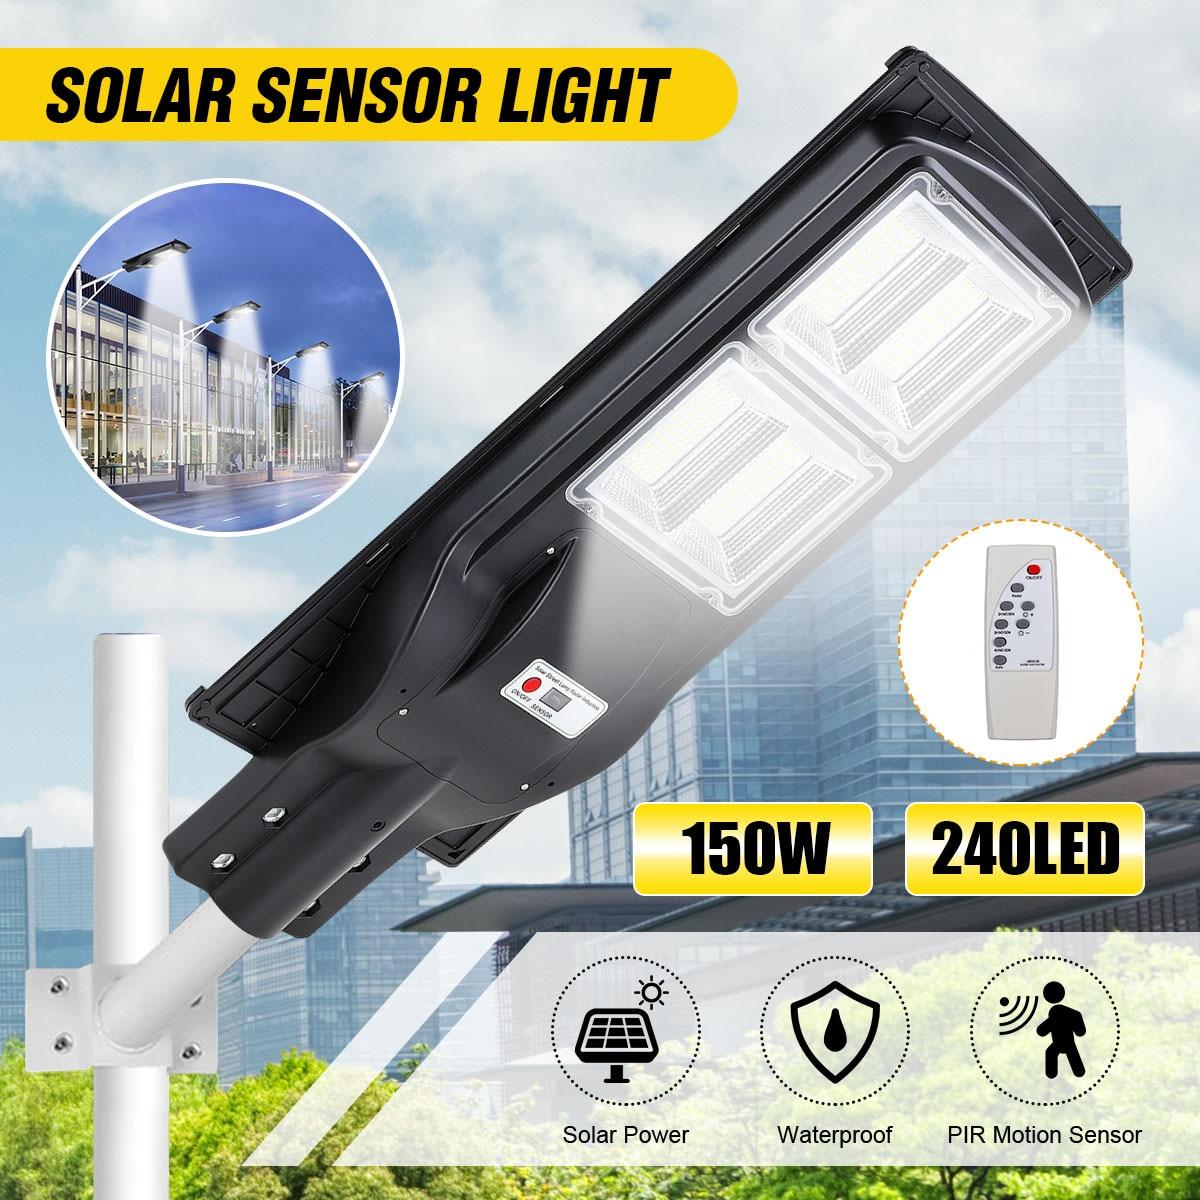 150W 240 LED Solar Street Light Light Control+Radar Sensing+Remote Control Waterproof Outdoor Garden Fence Wall Timer Lamp